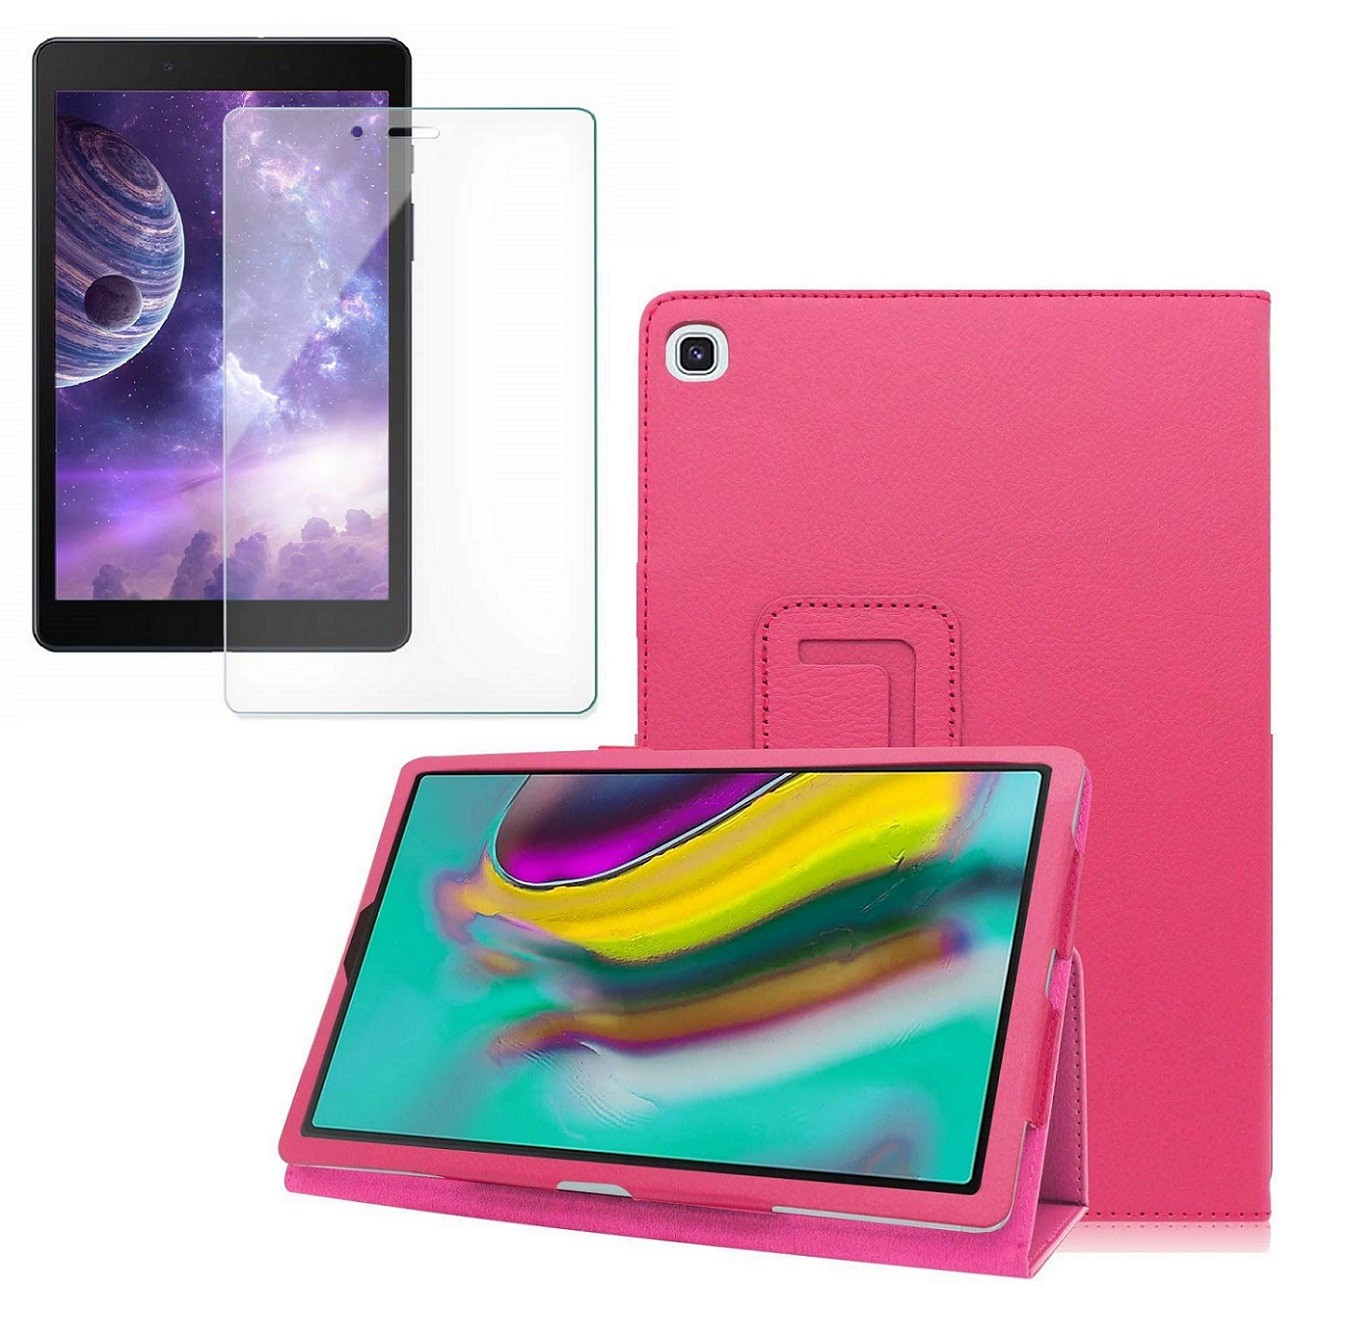 Kit Capa Tablet Samsung Galaxy Tab A 8 T290 T295 T297 Magnética Rosa + Película de Vidro